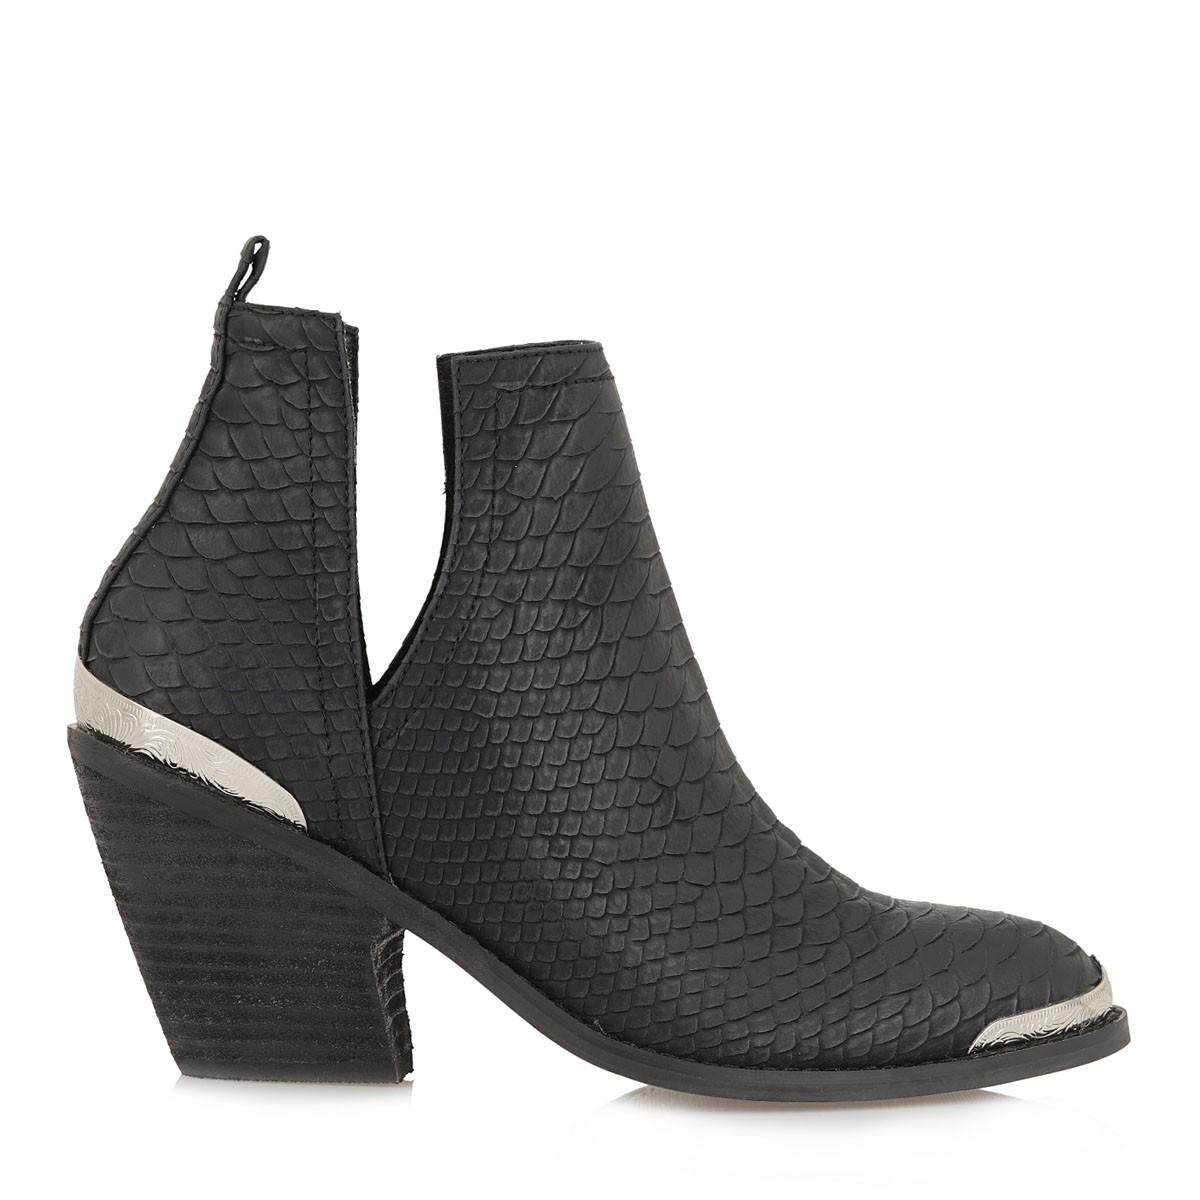 Exe Shoes Γυναικεία Μποτάκια WEST-588 Μαύρο Anaconta J37005885J26